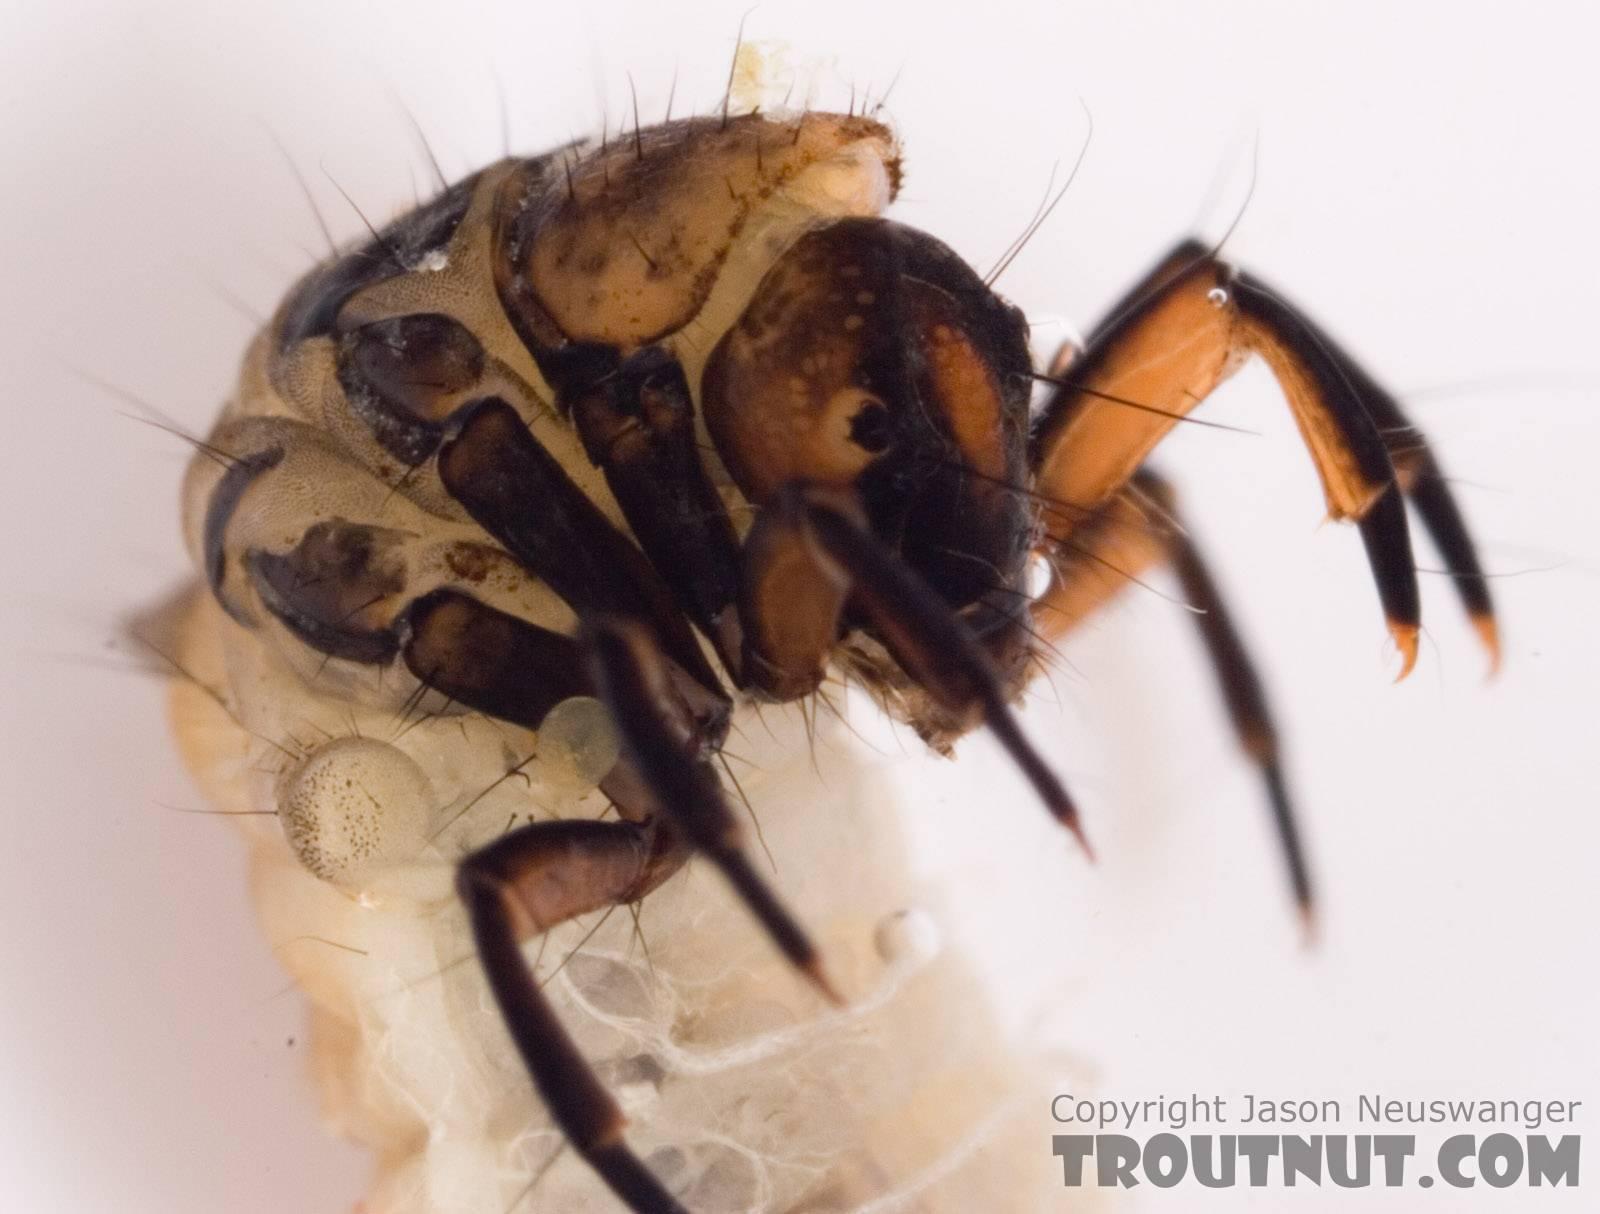 Neophylax (Autumn Mottled Sedges) Caddisfly Larva from Fall Creek in New York